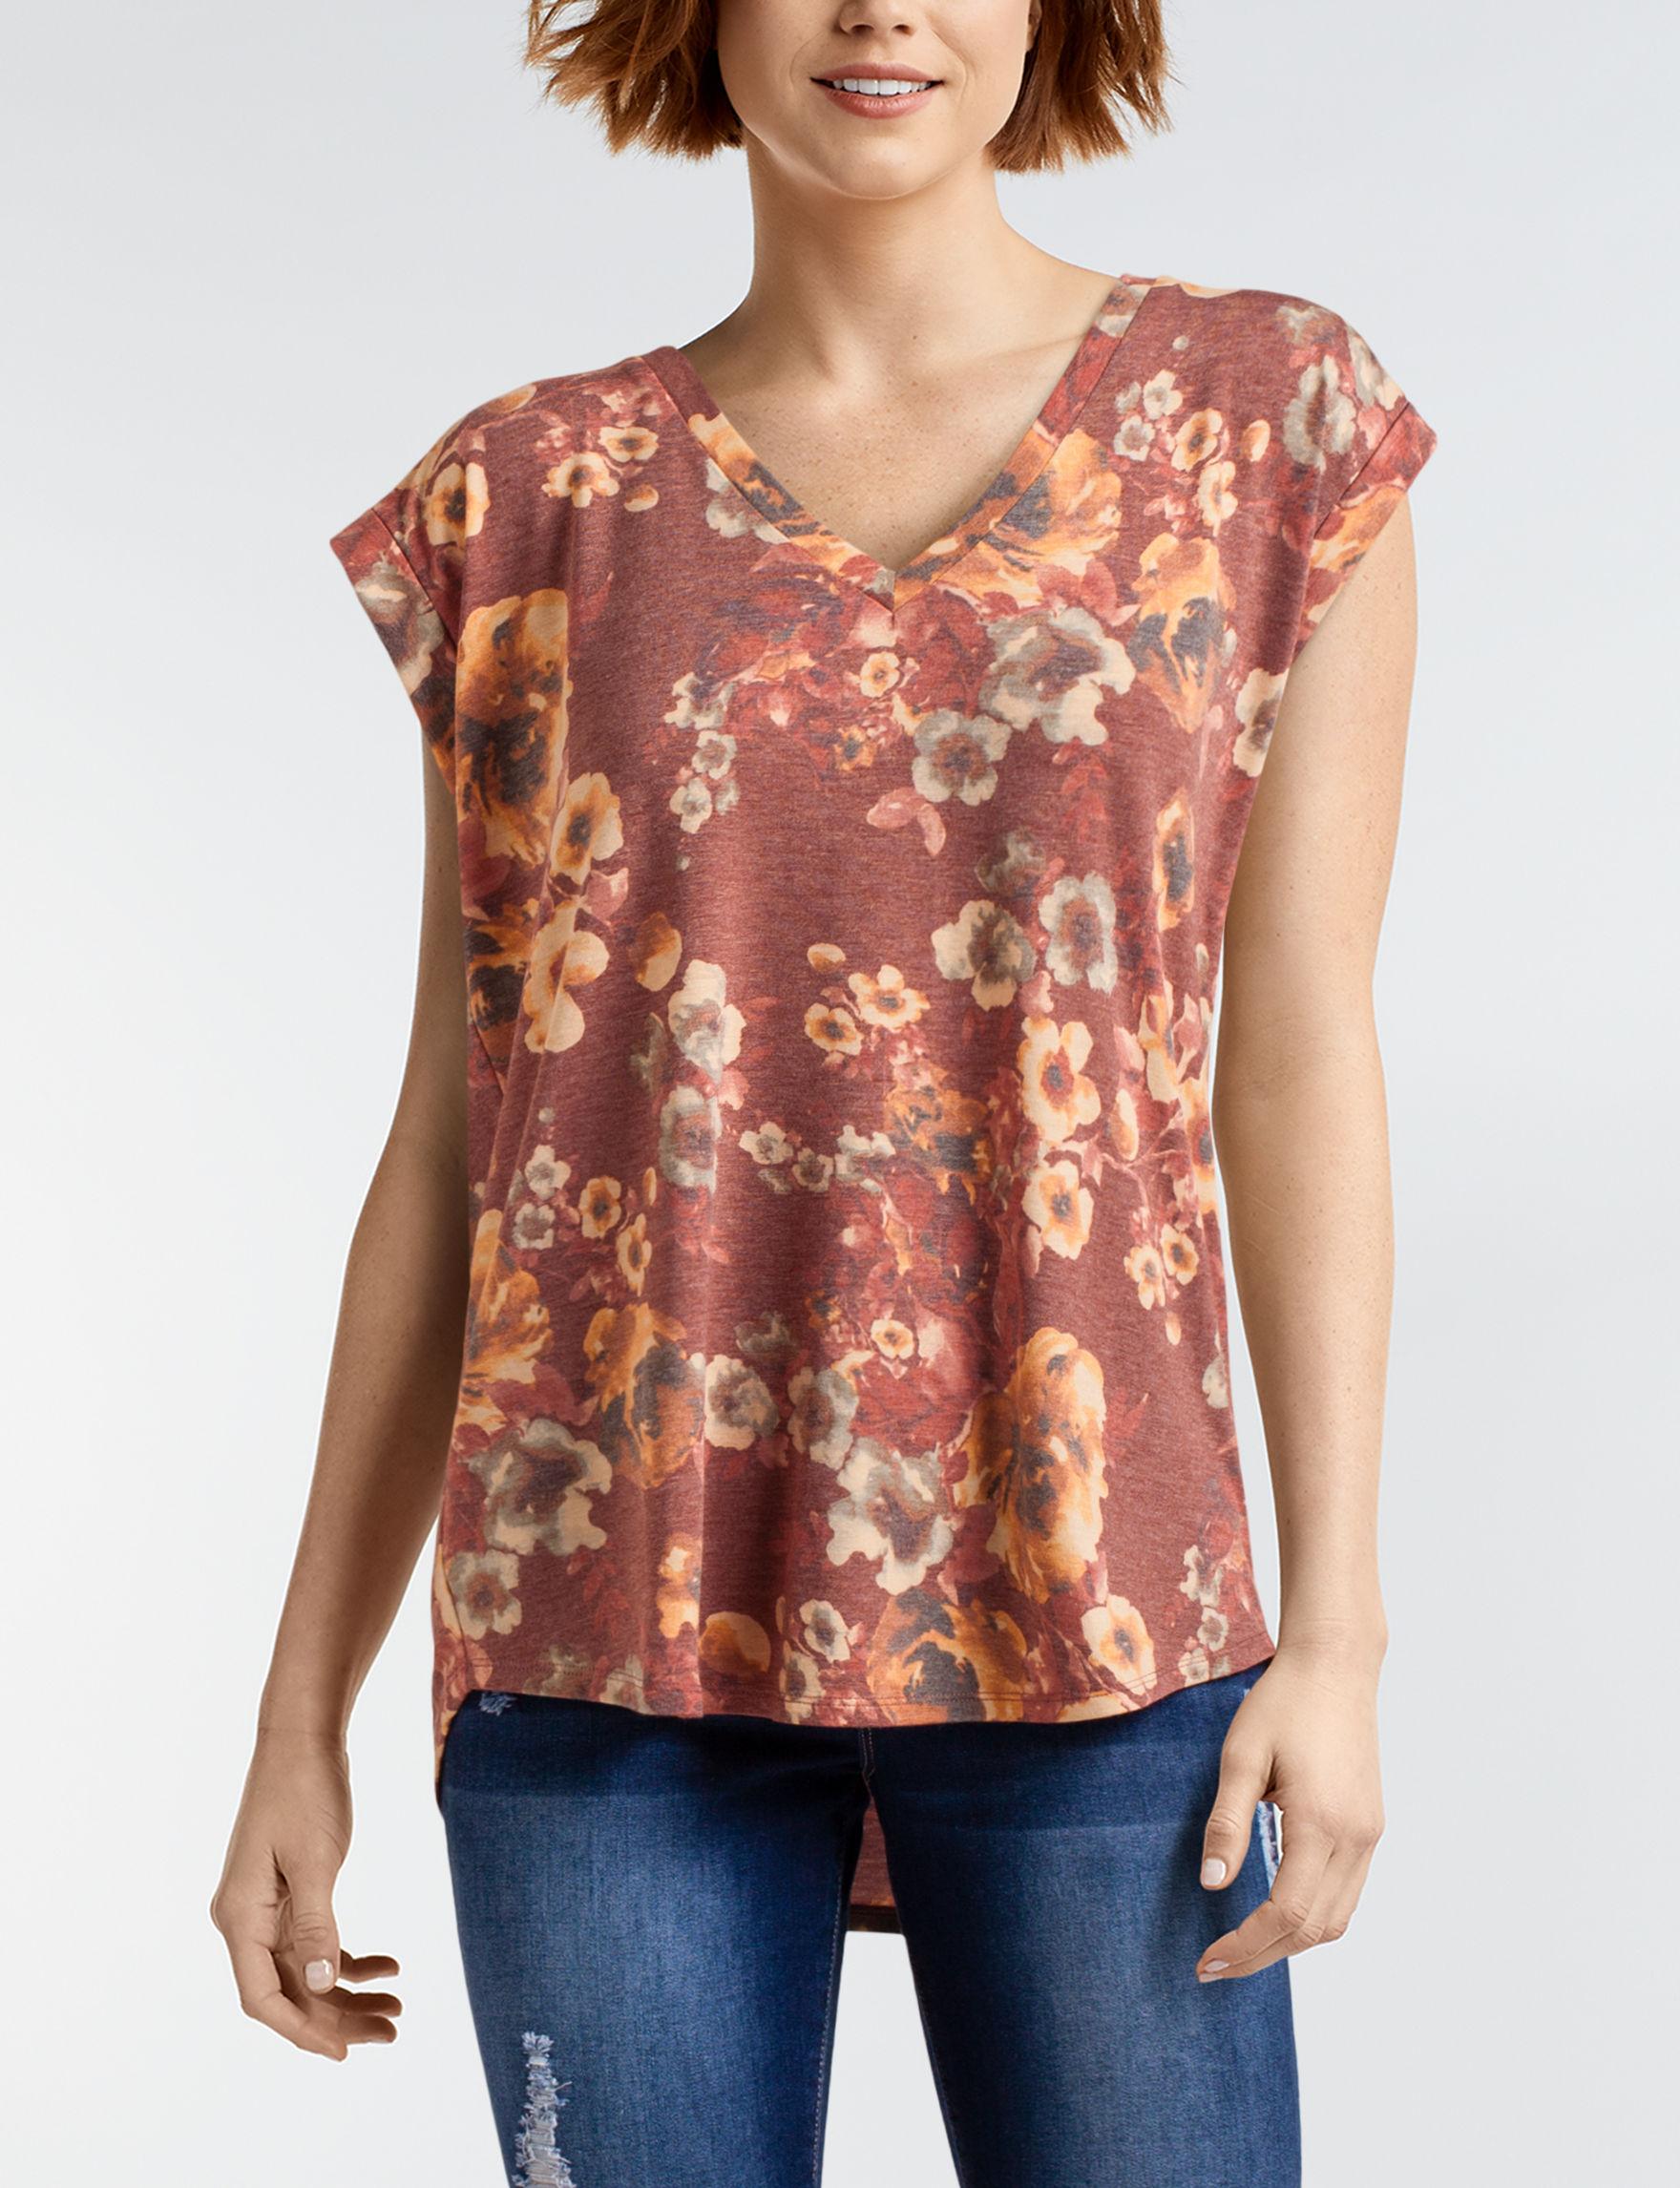 Signature Studio Rose Shirts & Blouses